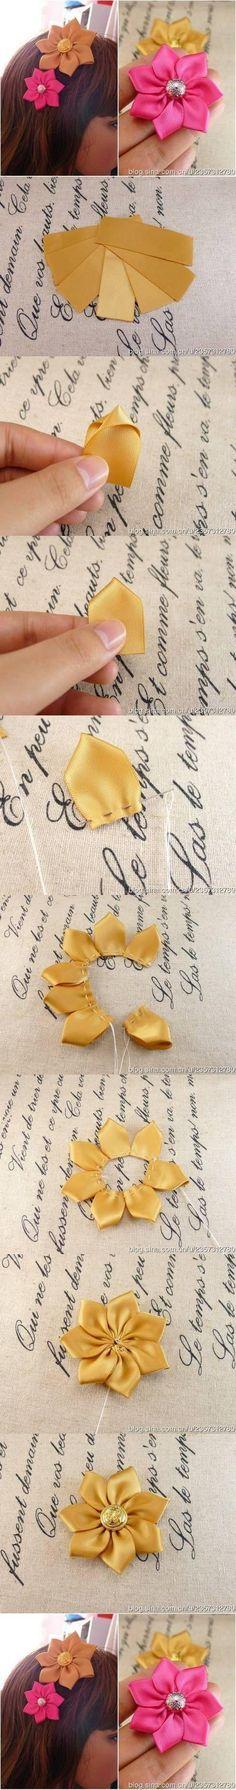 DIY Tutorial DIY Ribbon Crafts / DIY Handmade Ribbon Flowers - Bead&Cord